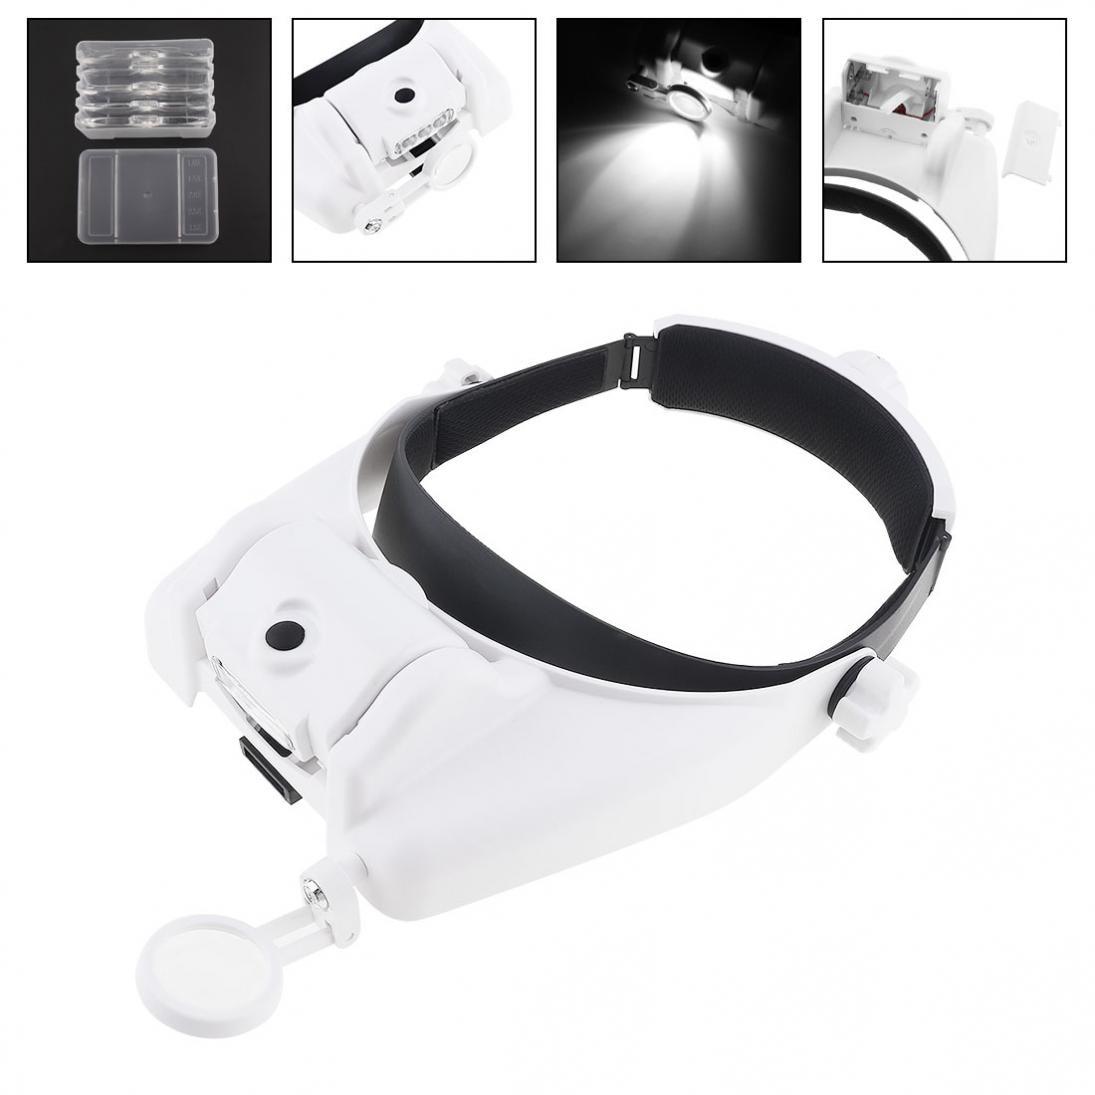 Ajustável Lupa Lupa 1.0X1.5X2.0X2.5X3.5 X Lente Headband Lupa Lupa com 3LED 8 lupa Óculos Criativo